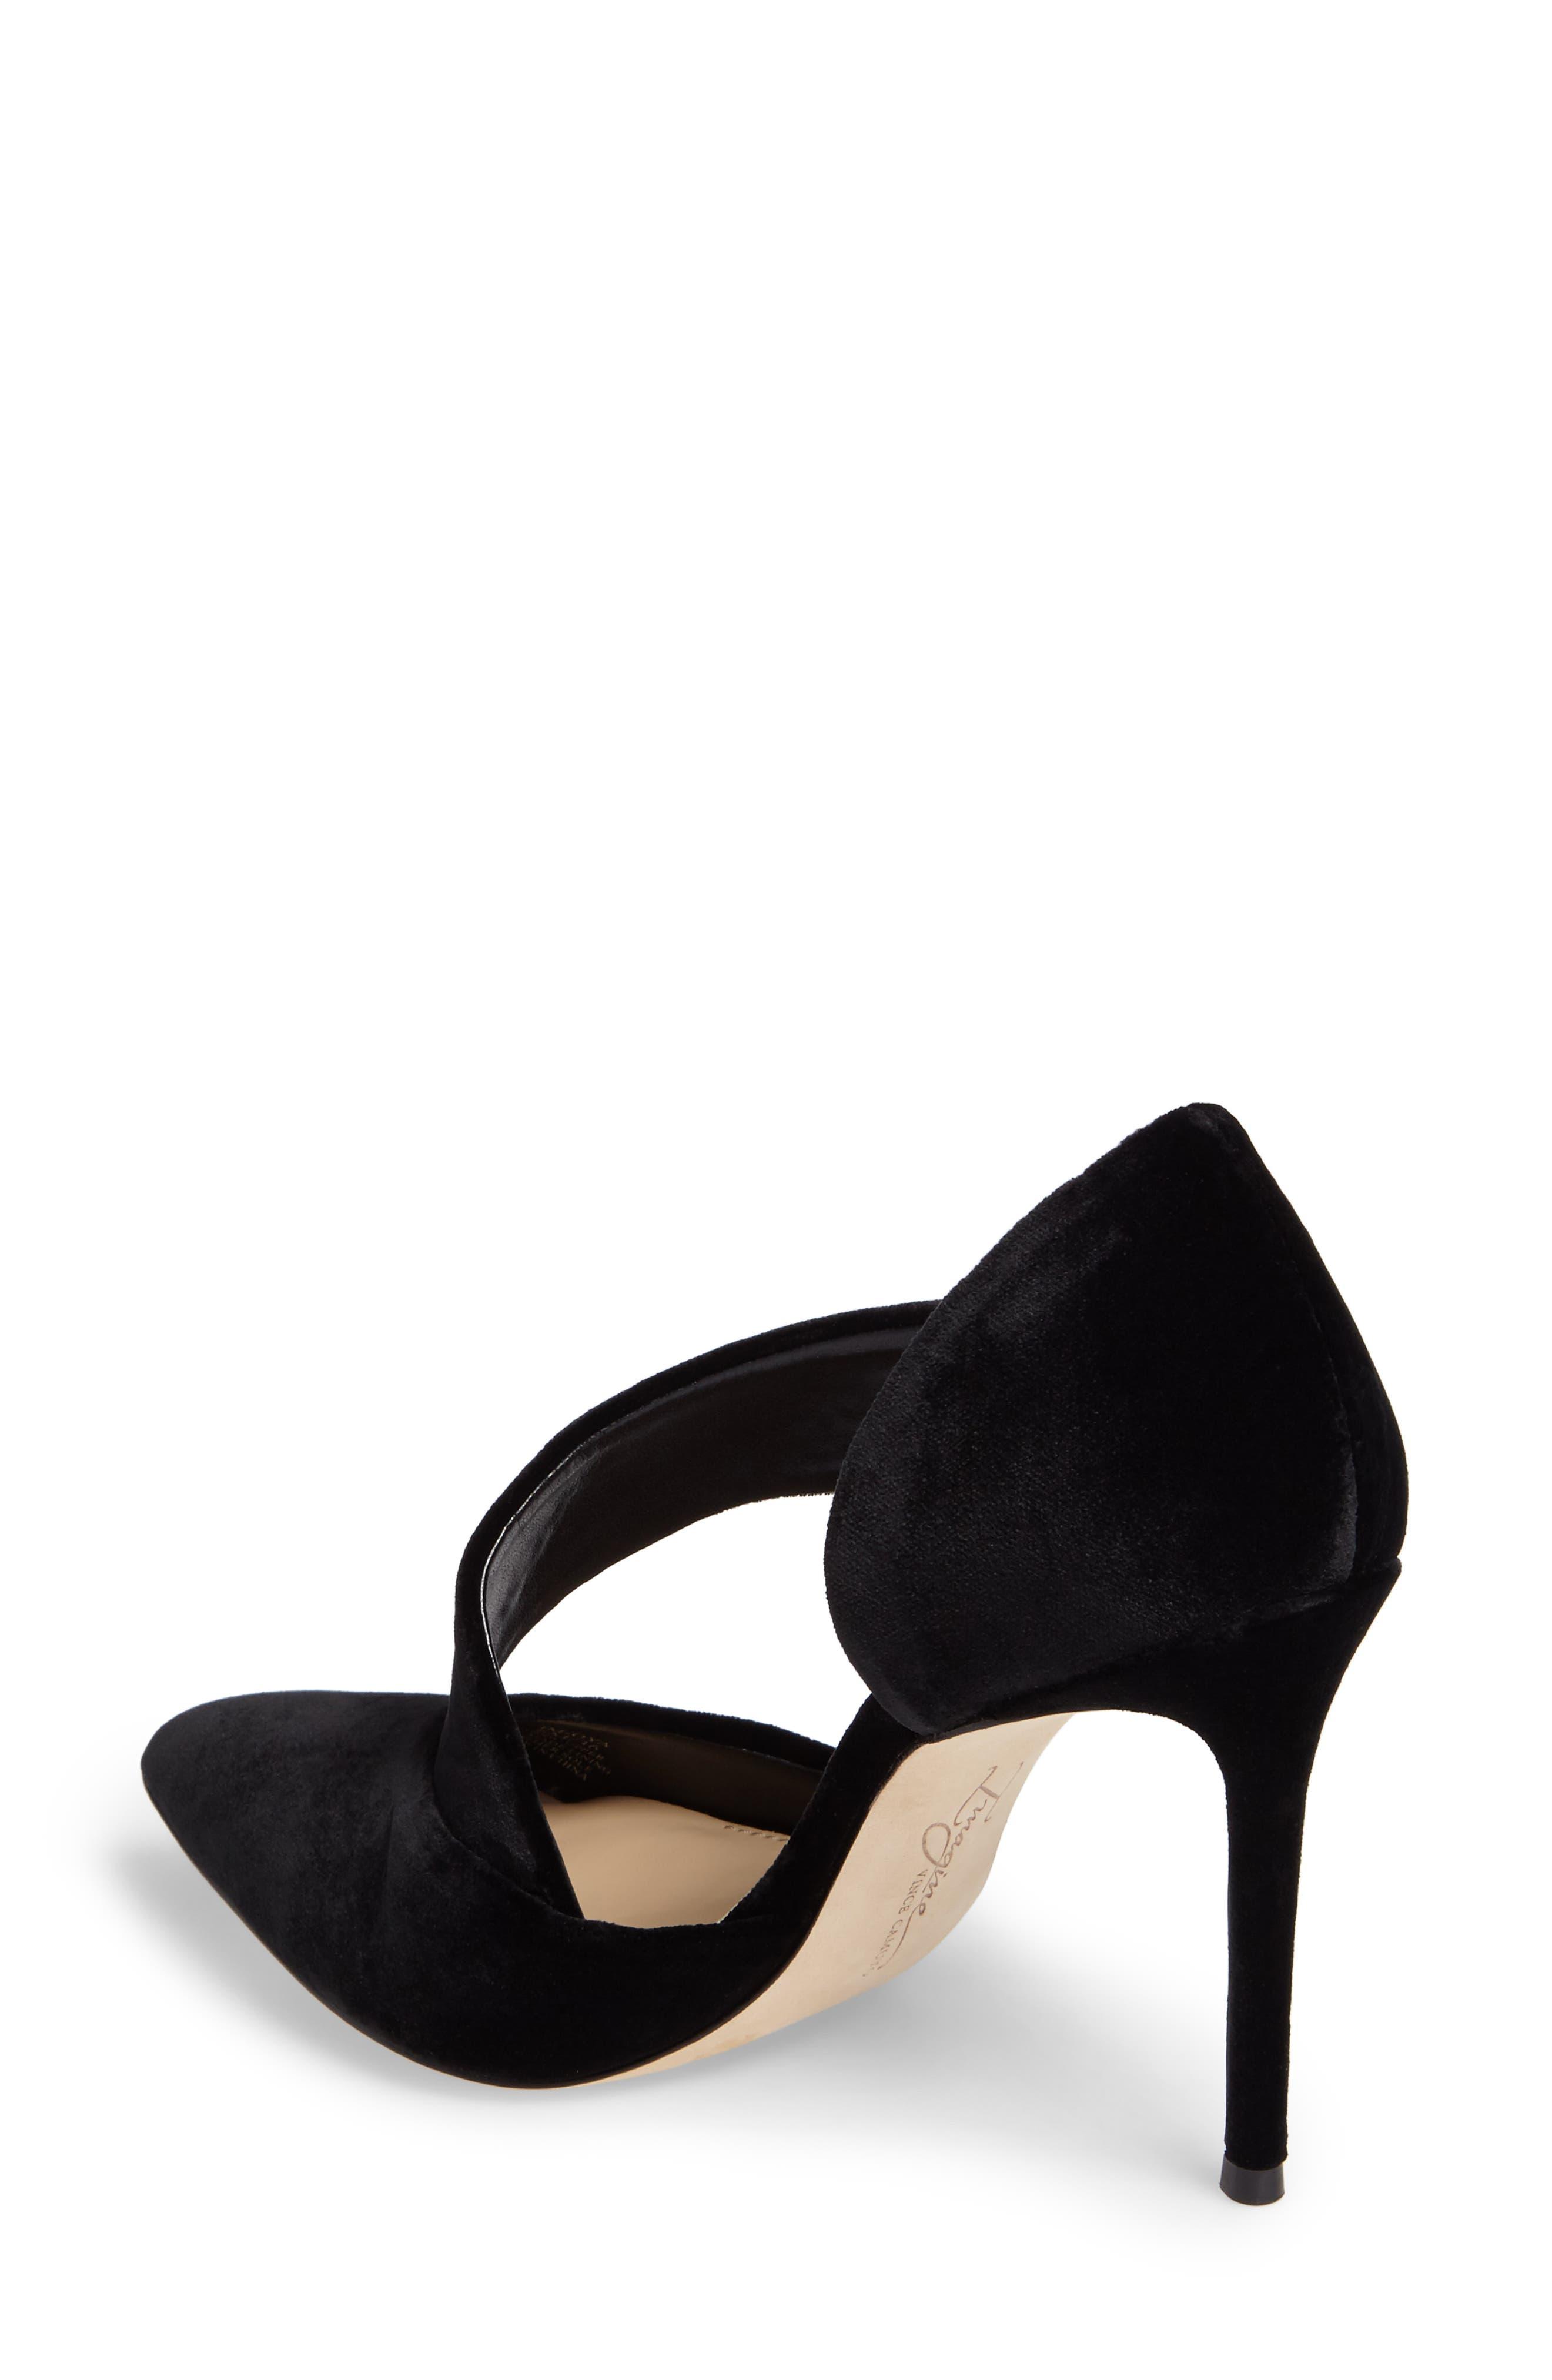 Oya Asymmetrical Pointy Toe Pump,                             Alternate thumbnail 2, color,                             Black Velvet